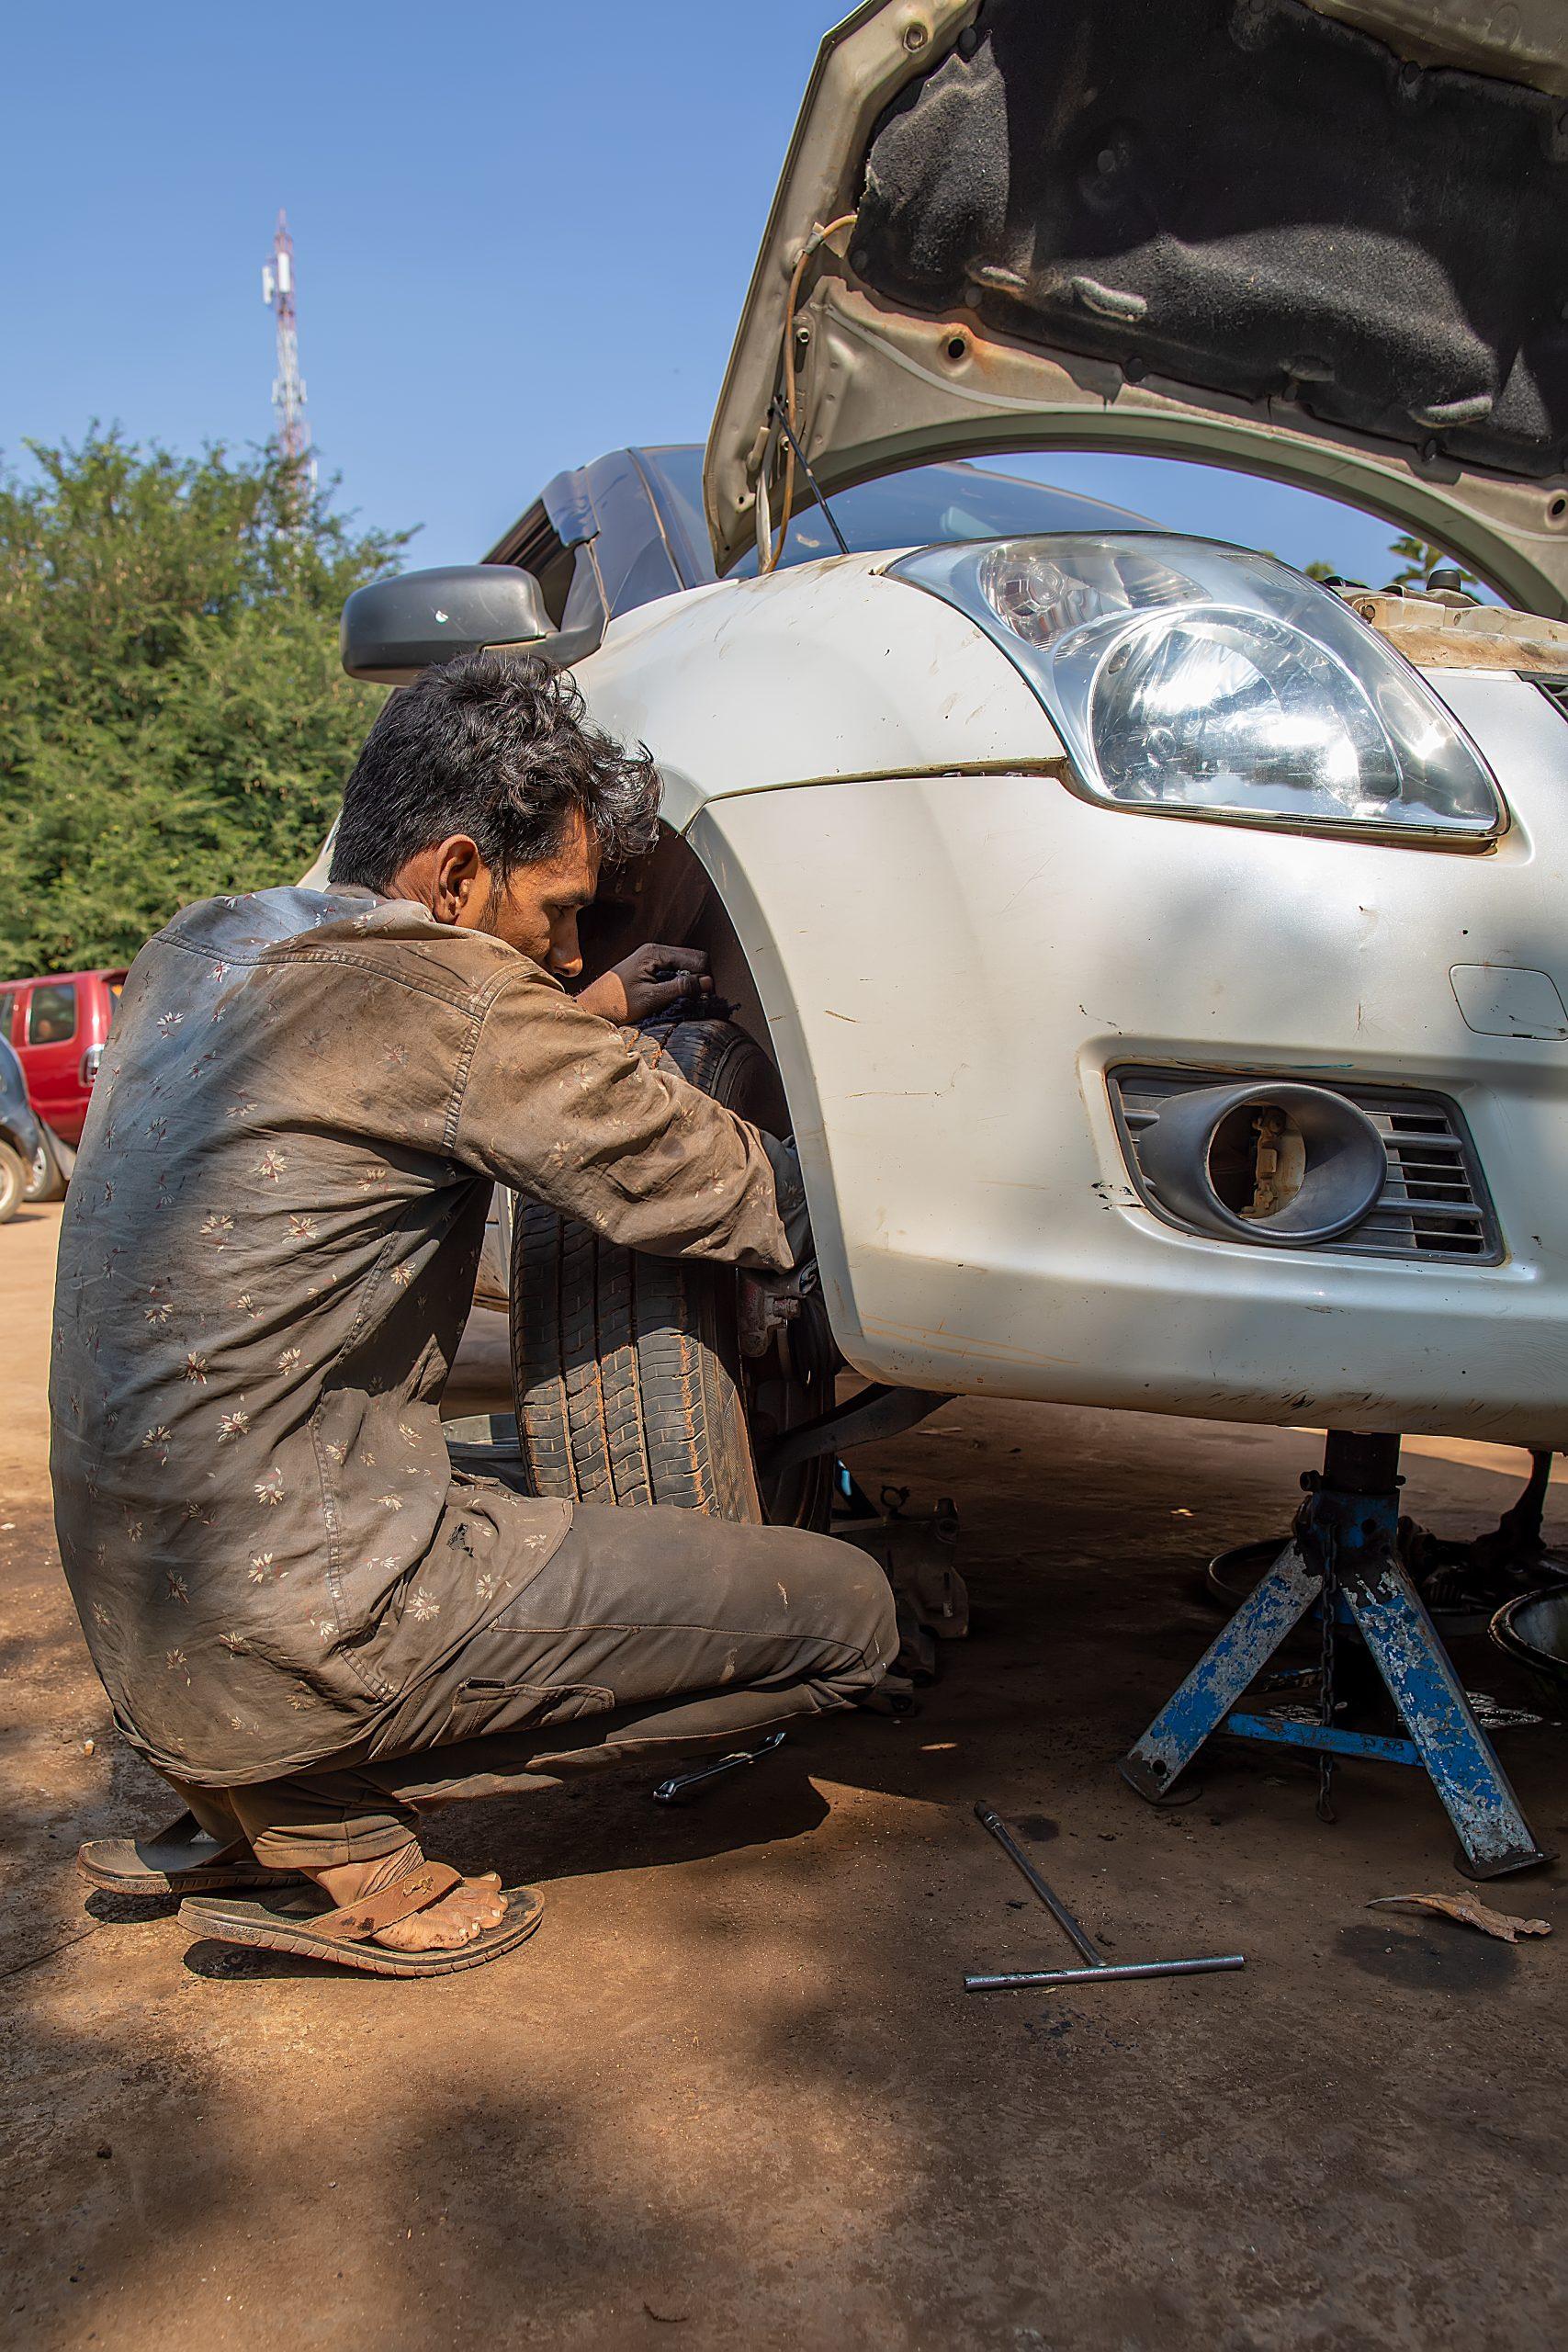 A car mechanic at work